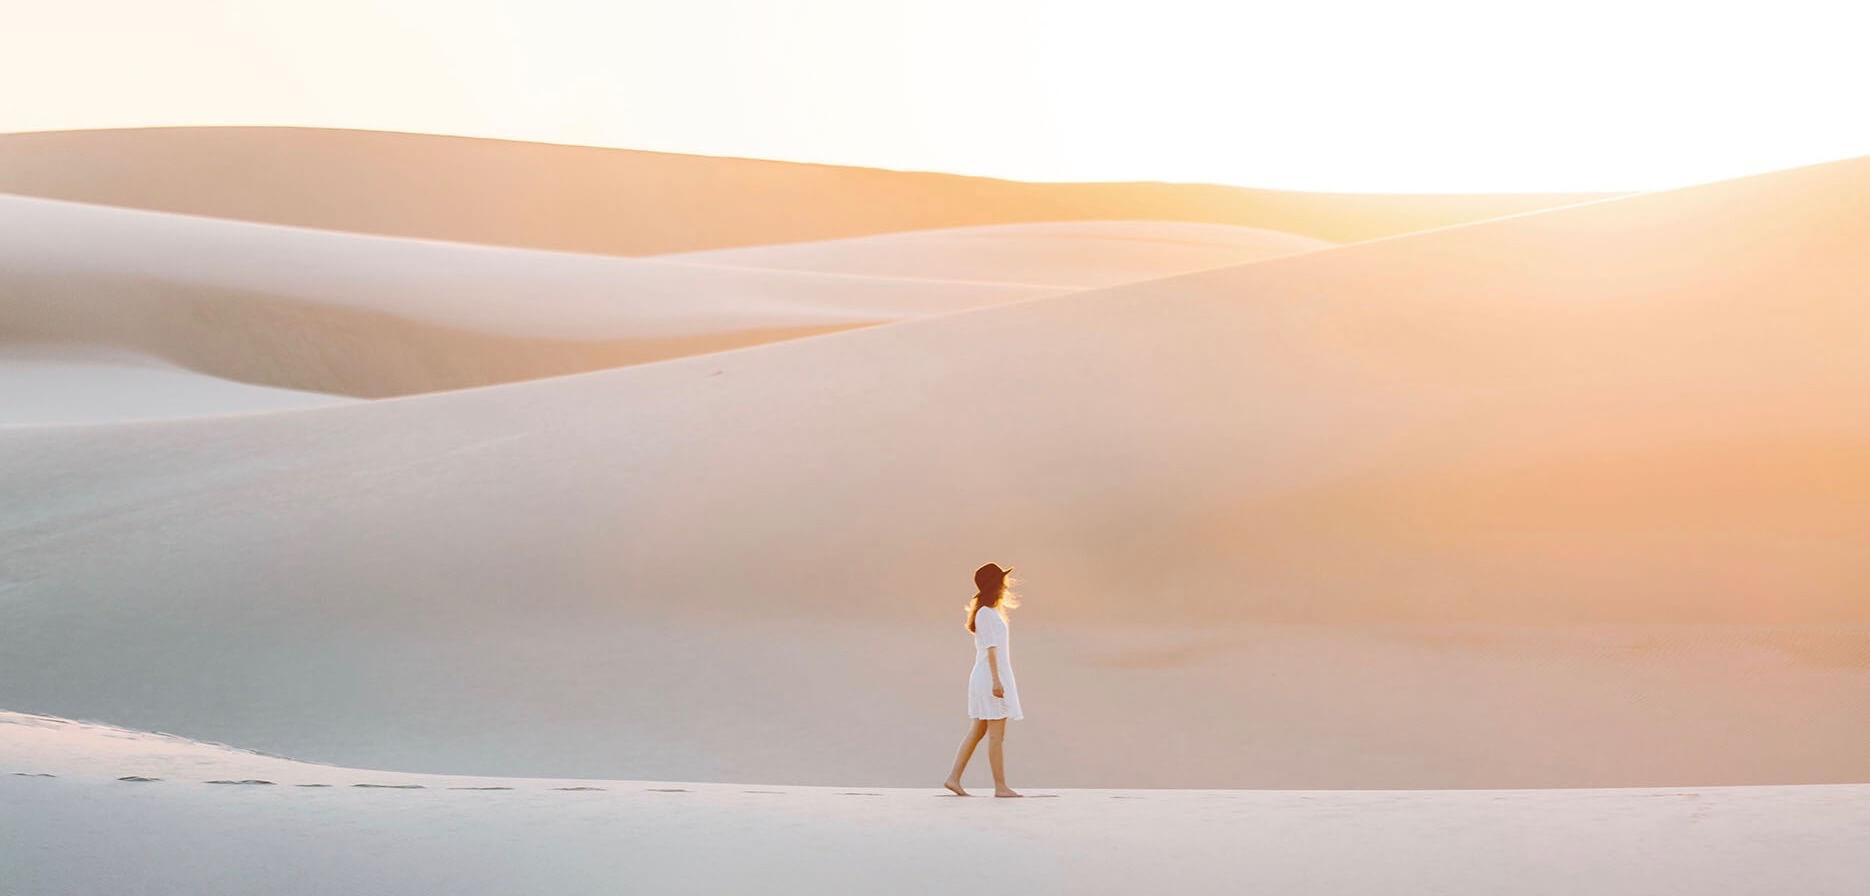 Emilie Ristevski photo of woman walking across sand dunes